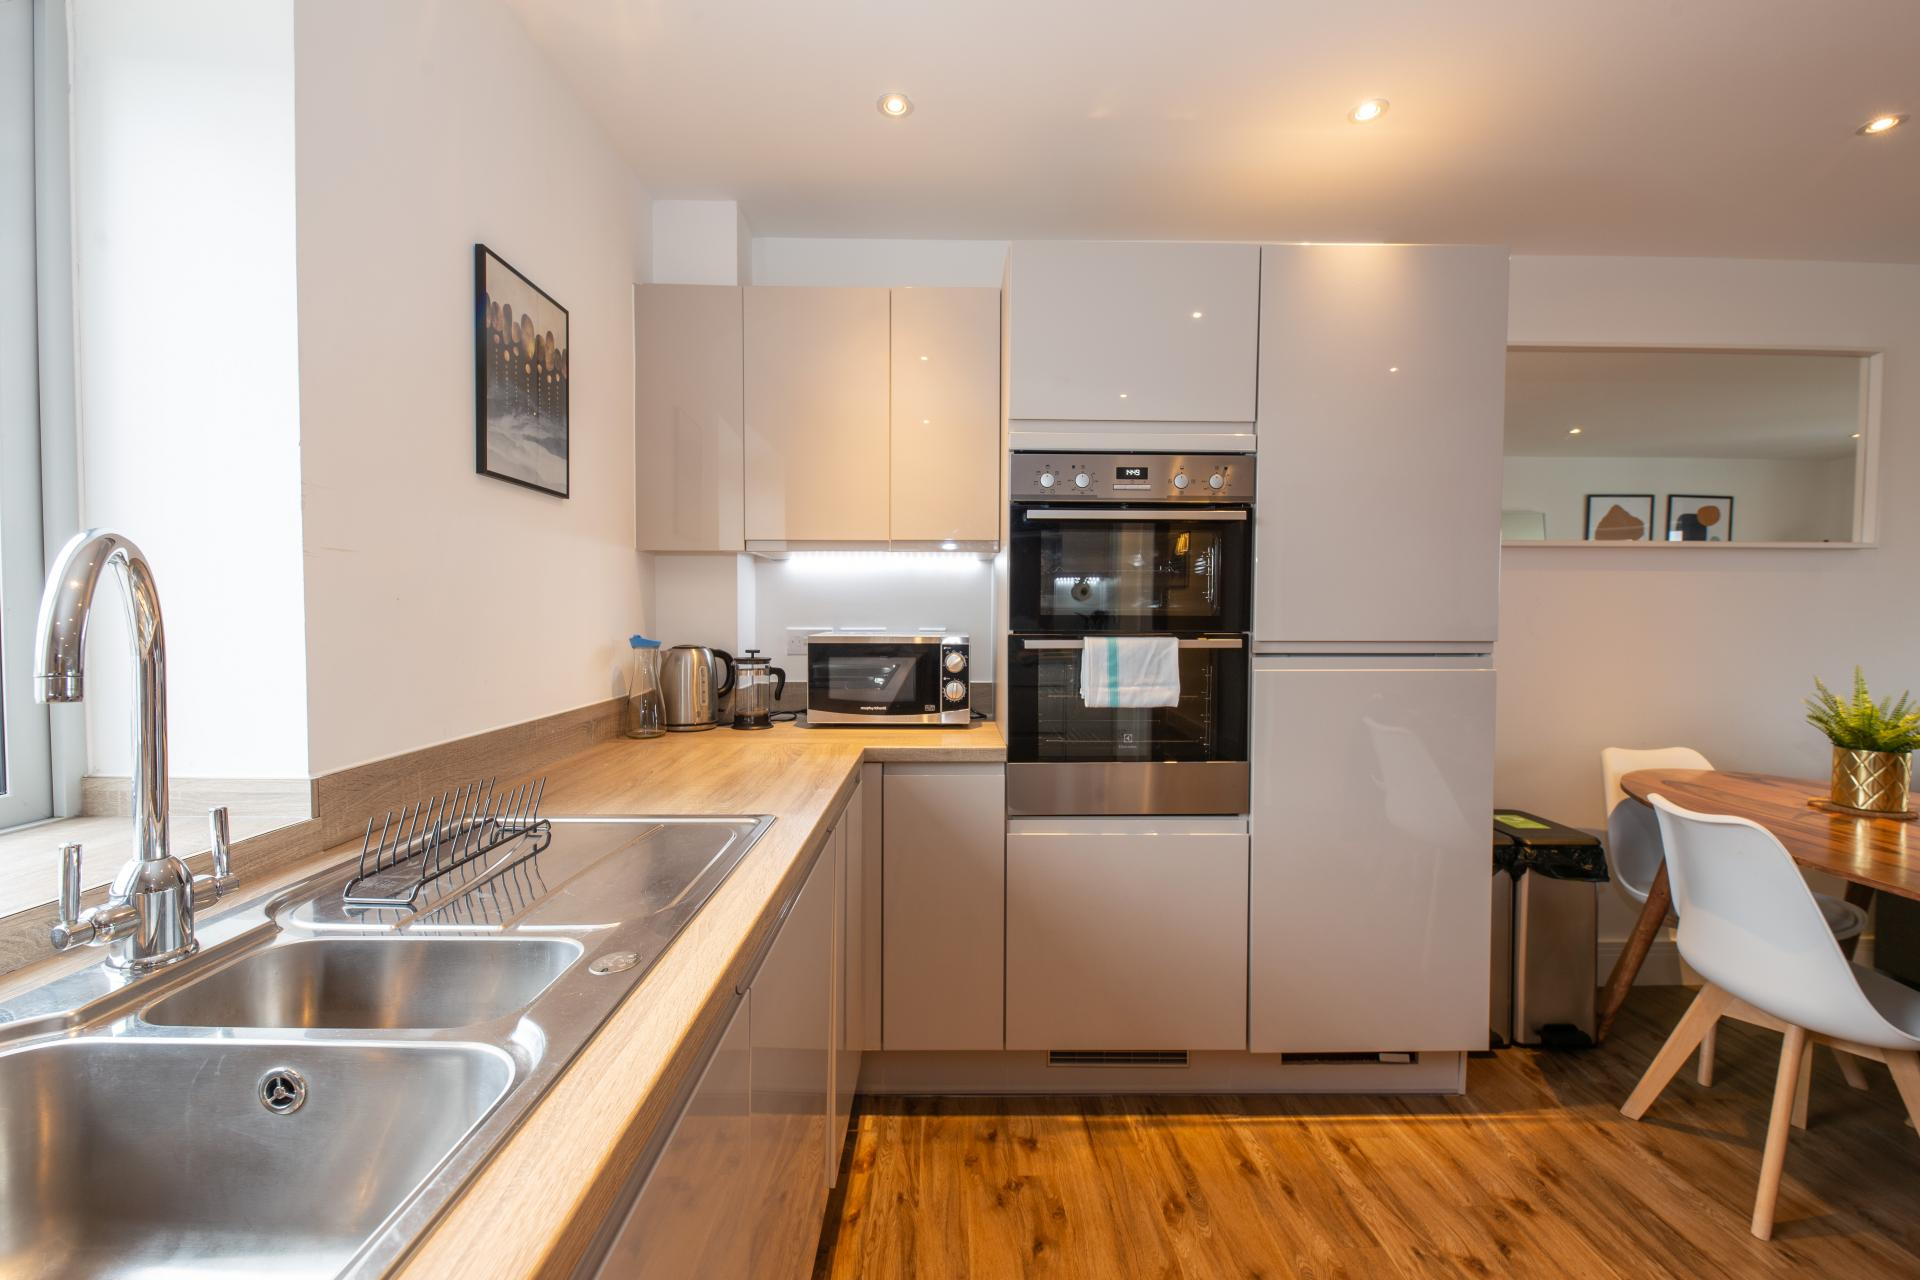 Kitchen at Austen House, Centre, Guildford - Citybase Apartments